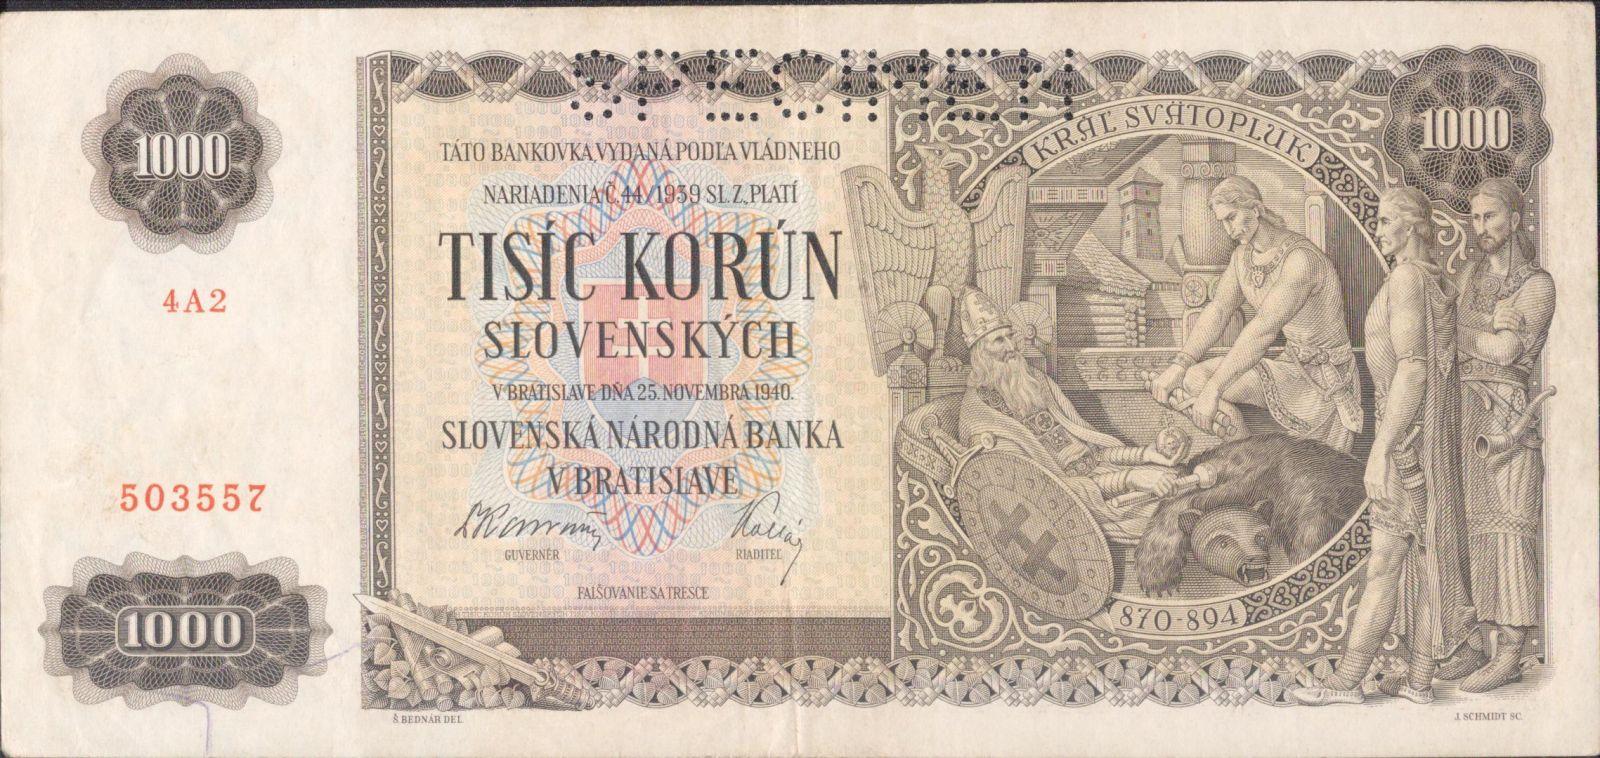 1000Ks/1940/, stav 1 perf. SPECIMEN, série 4A2